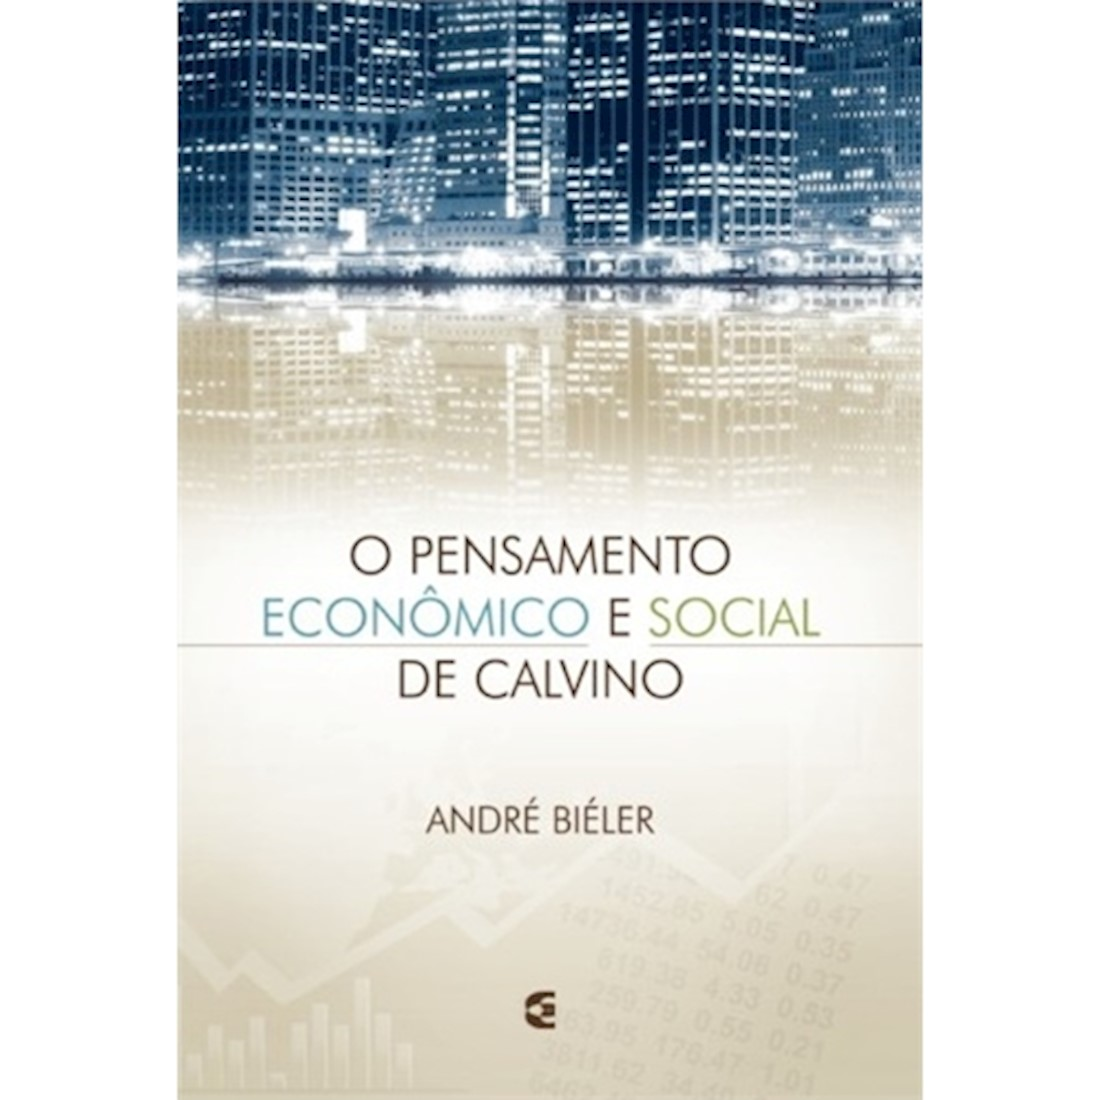 Livro O Pensamento Econômico e Social de Calvino